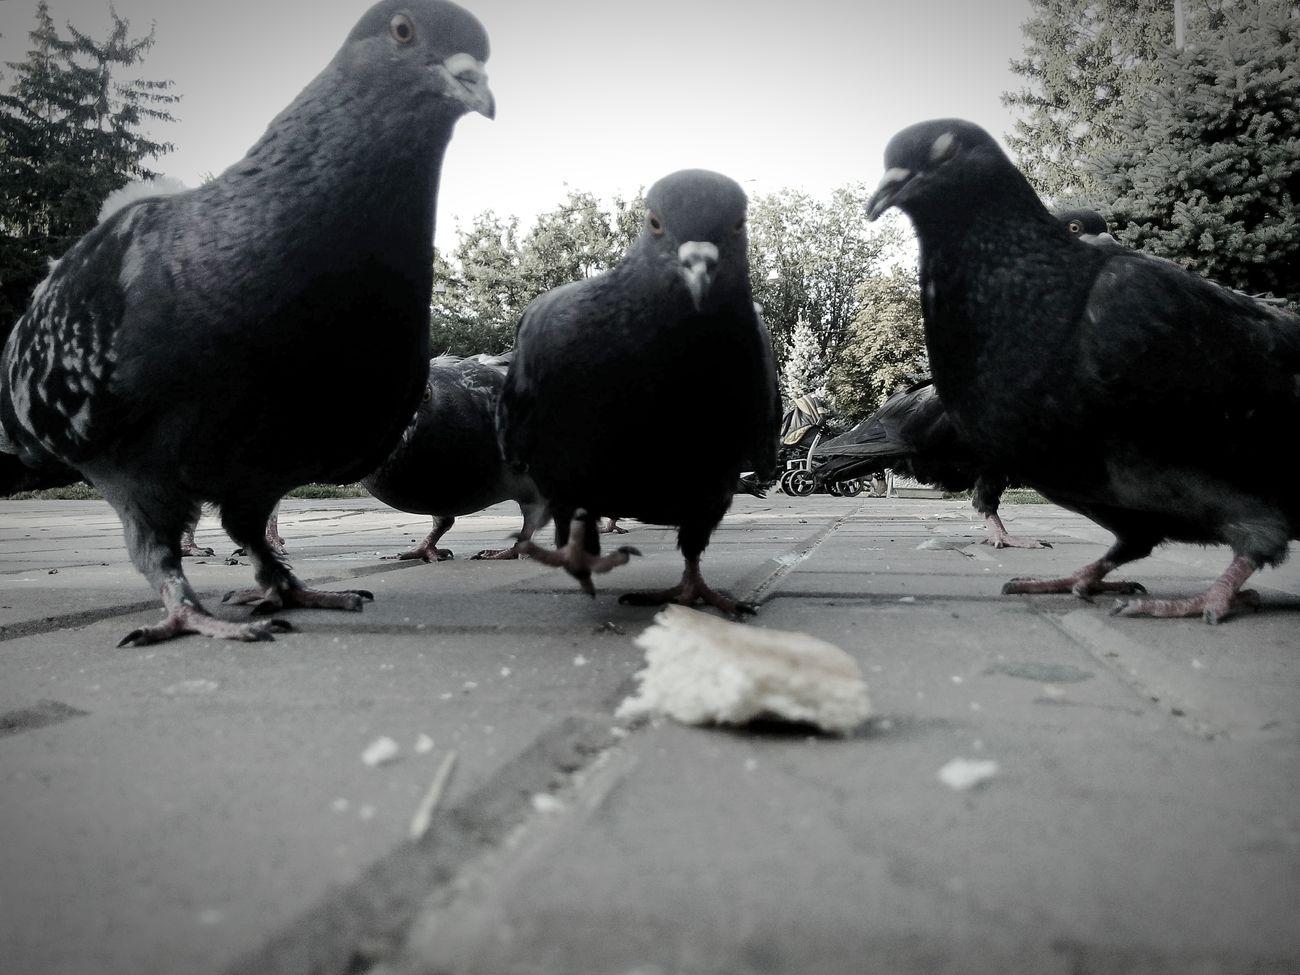 Bird Animal No People Animal Themes Outdoors Rostov-on-Don Ростов-на-Дону Close-up город Pigeons Doves Square голуби кормитьголубей птицы площадь